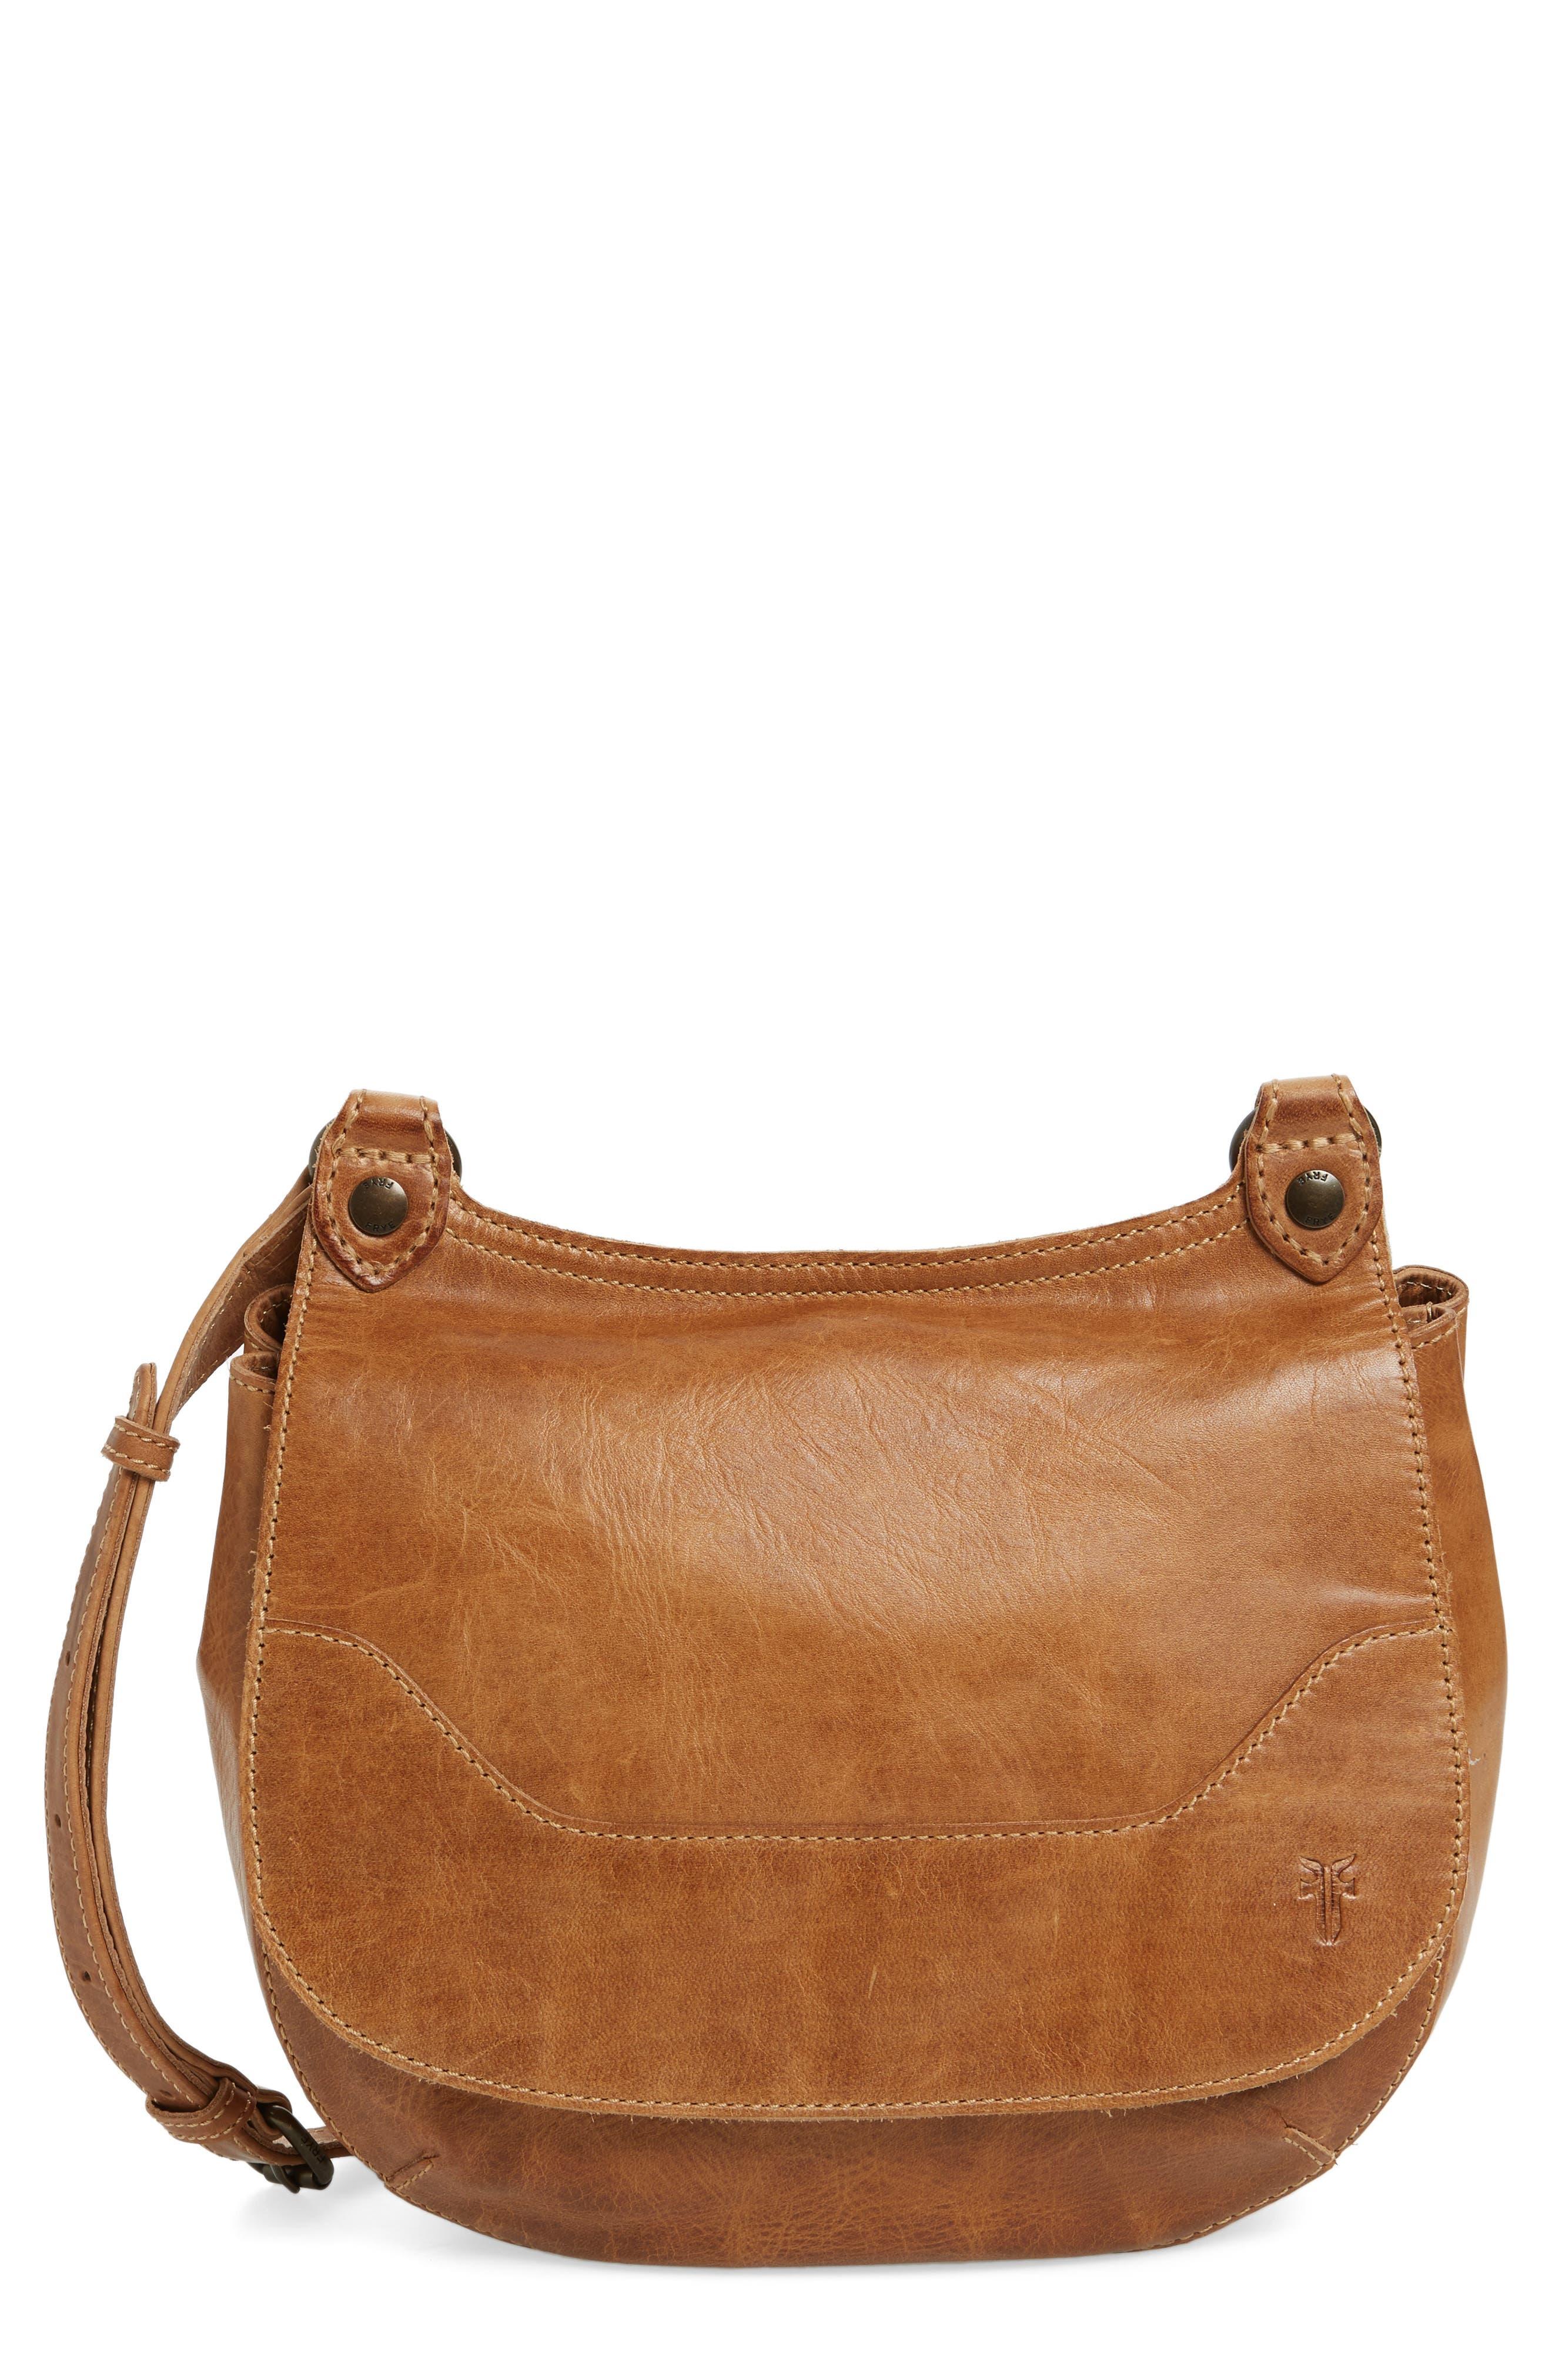 Alternate Image 1 Selected - Frye 'Melissa' Leather Crossbody Bag